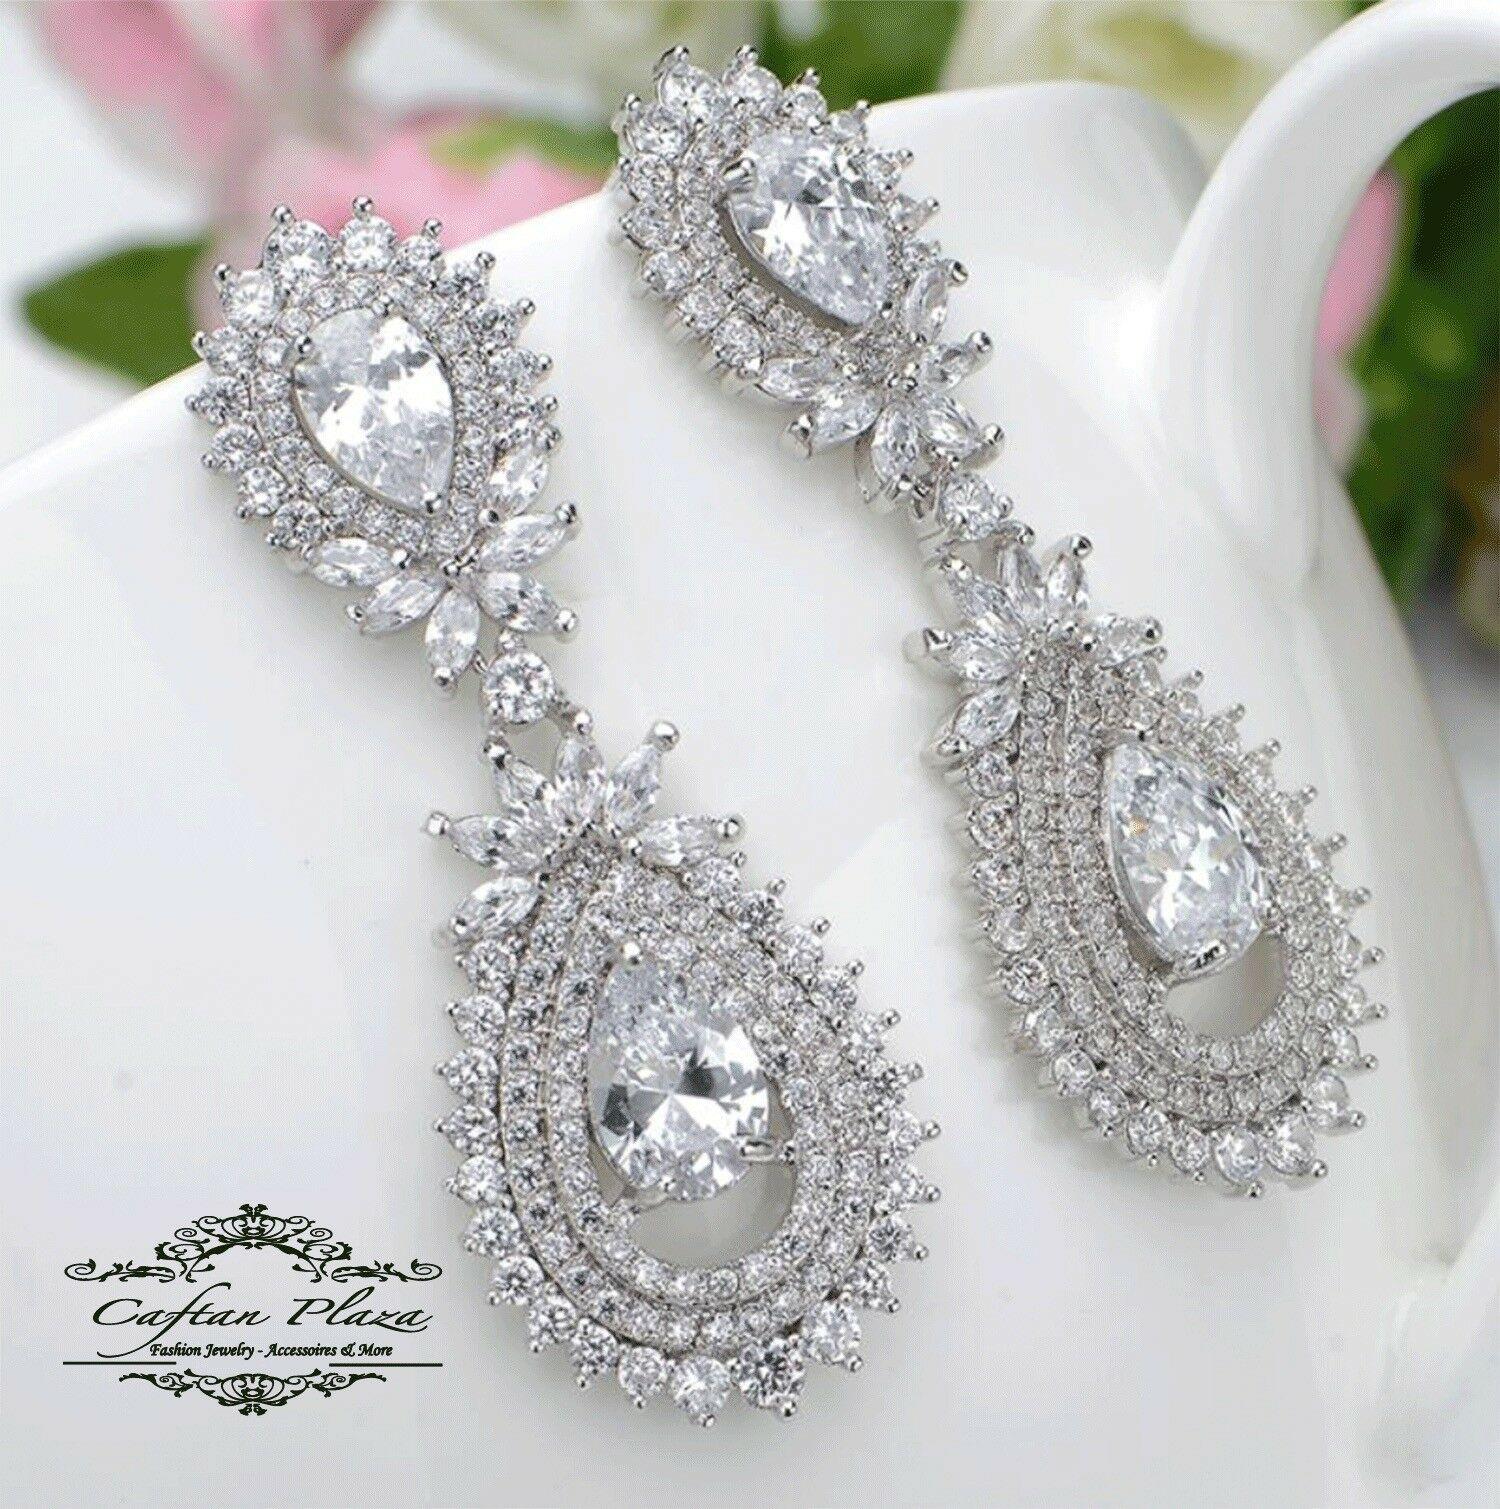 Ohrhänger Luxus Ohrringe Zirkonia AAA Chandelier XXL STELLUX™ Kristalle Weiss